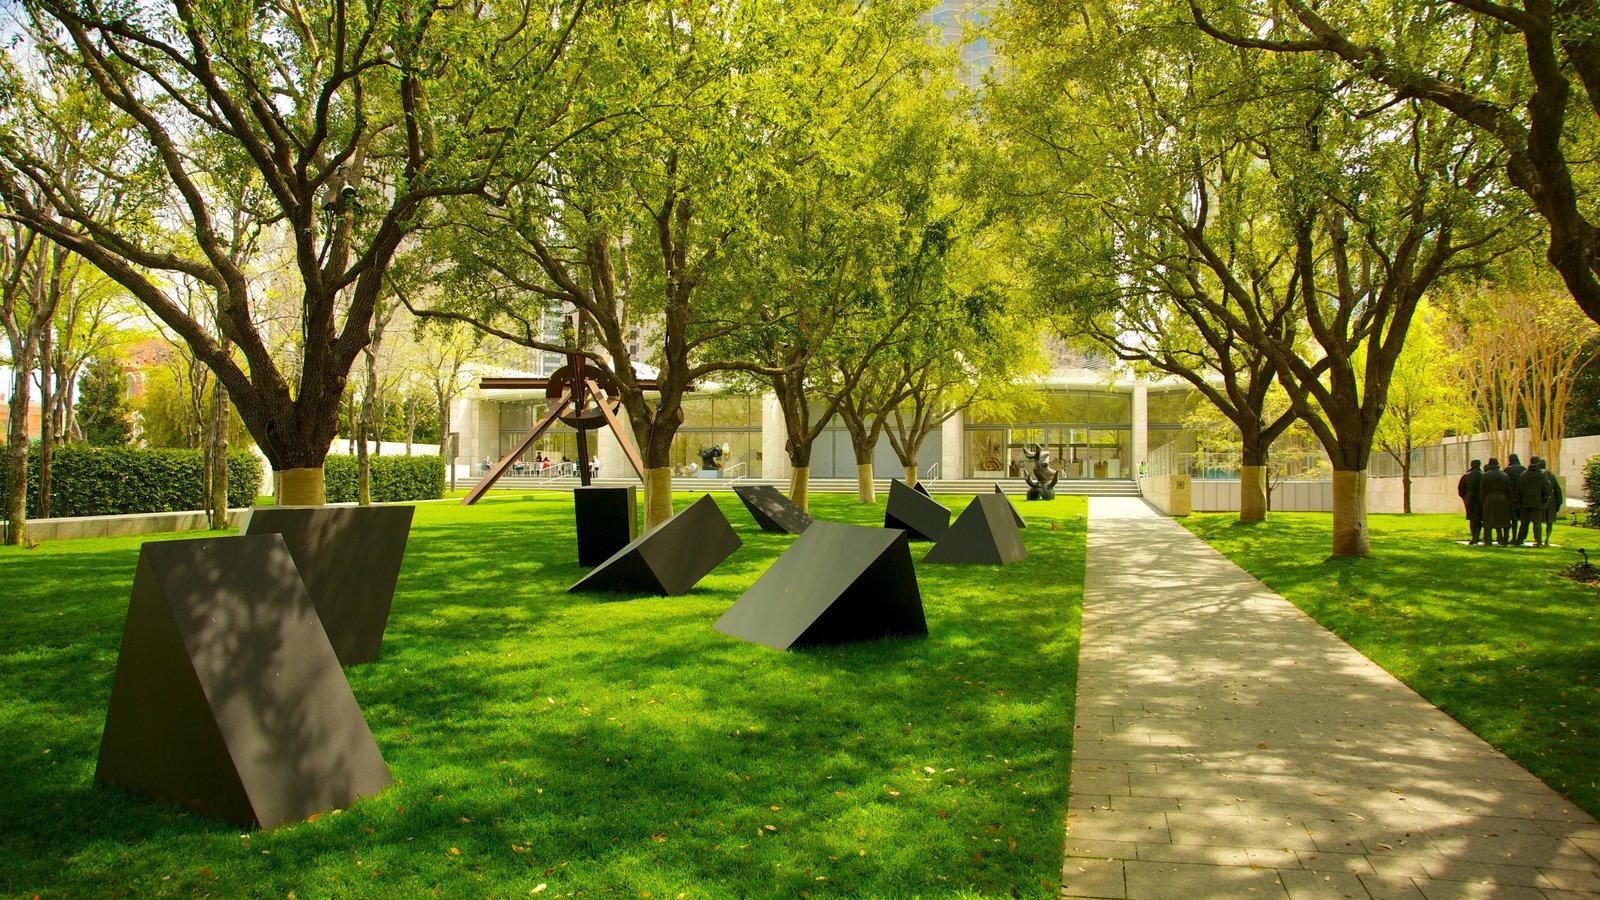 Nasher Sculpture Center Featuring A Garden, Modern Architecture And Outdoor  Art